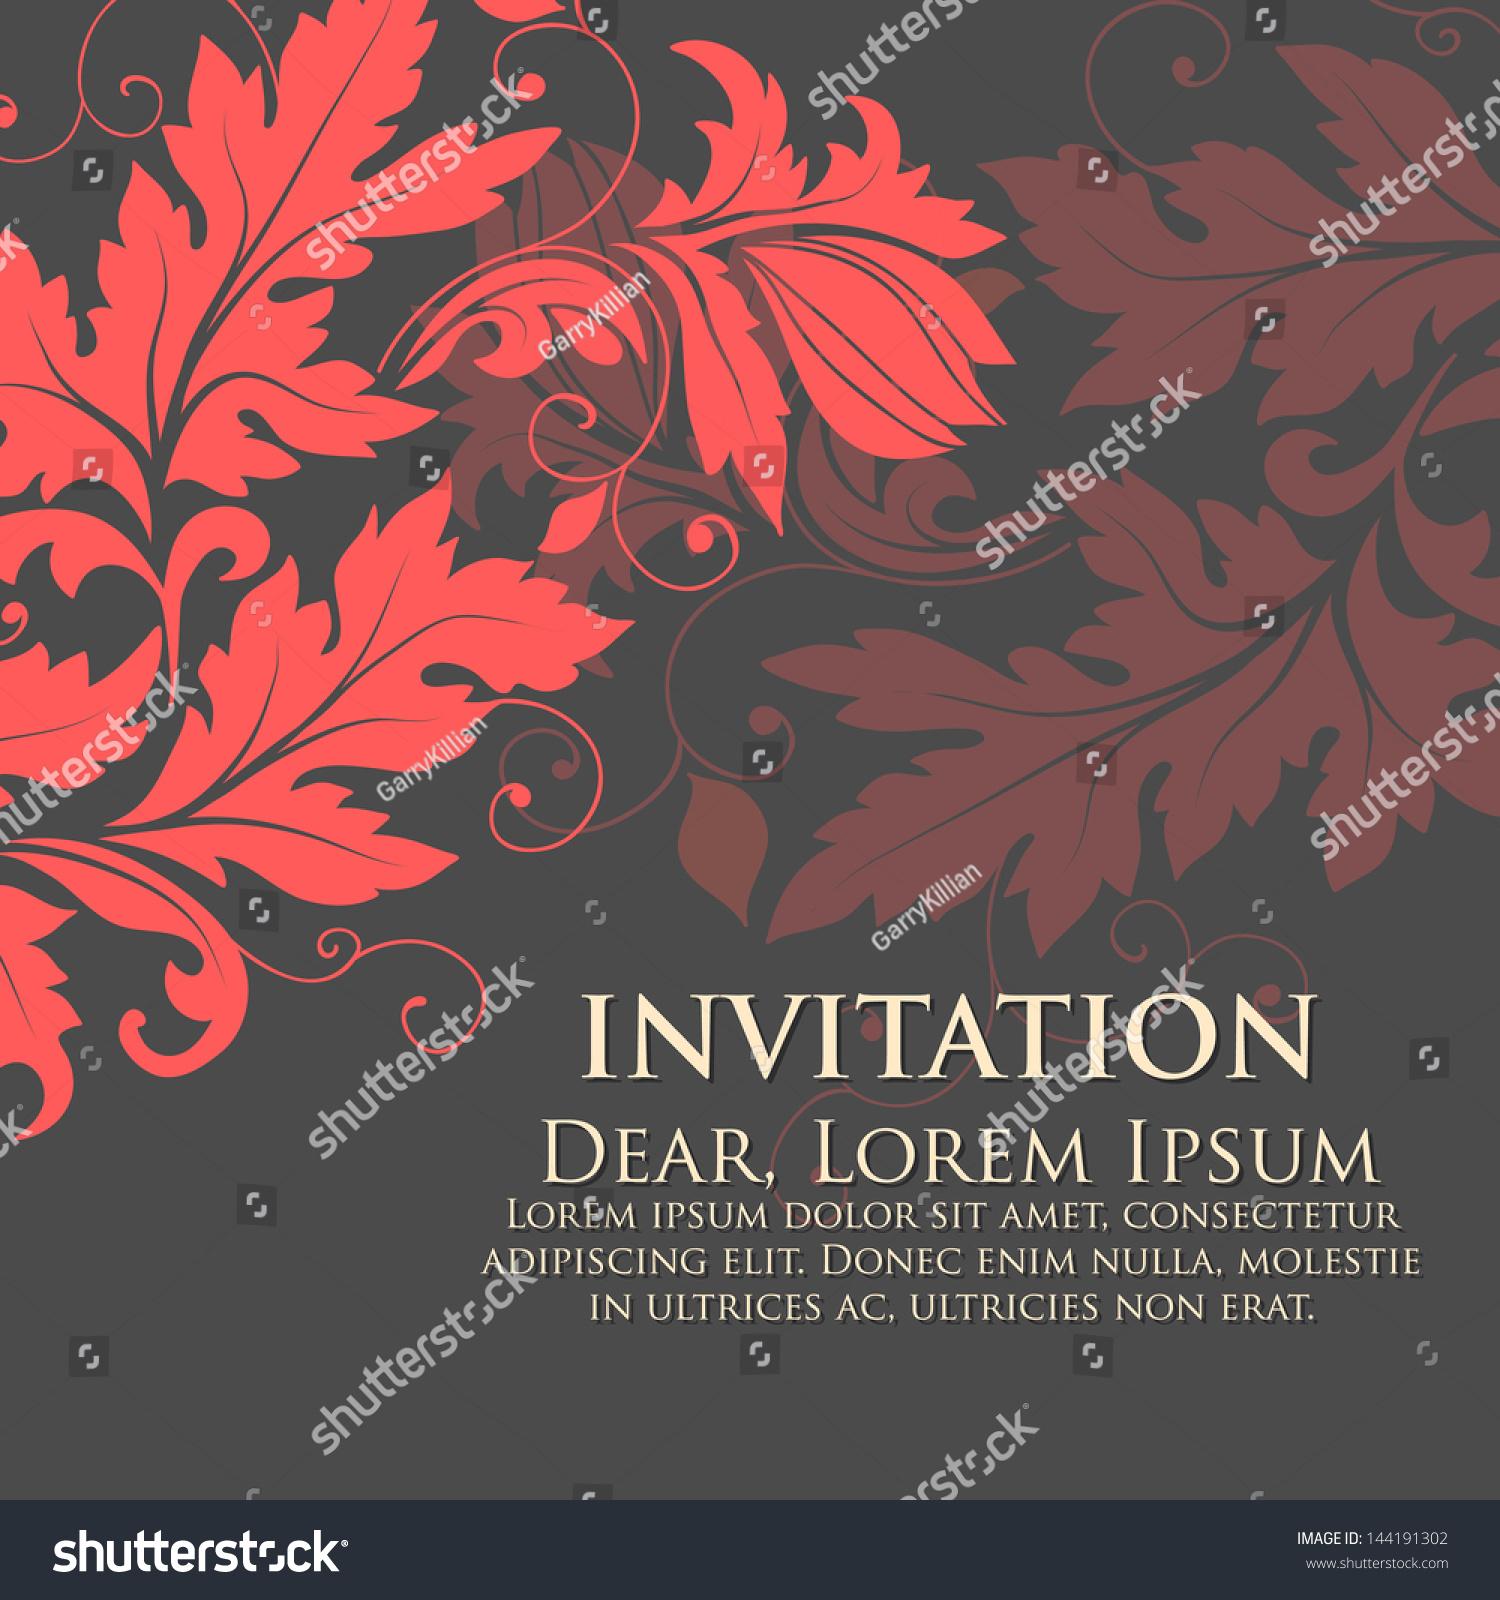 Invitation Wedding Card Flower Background Elegant Stock Vector ...